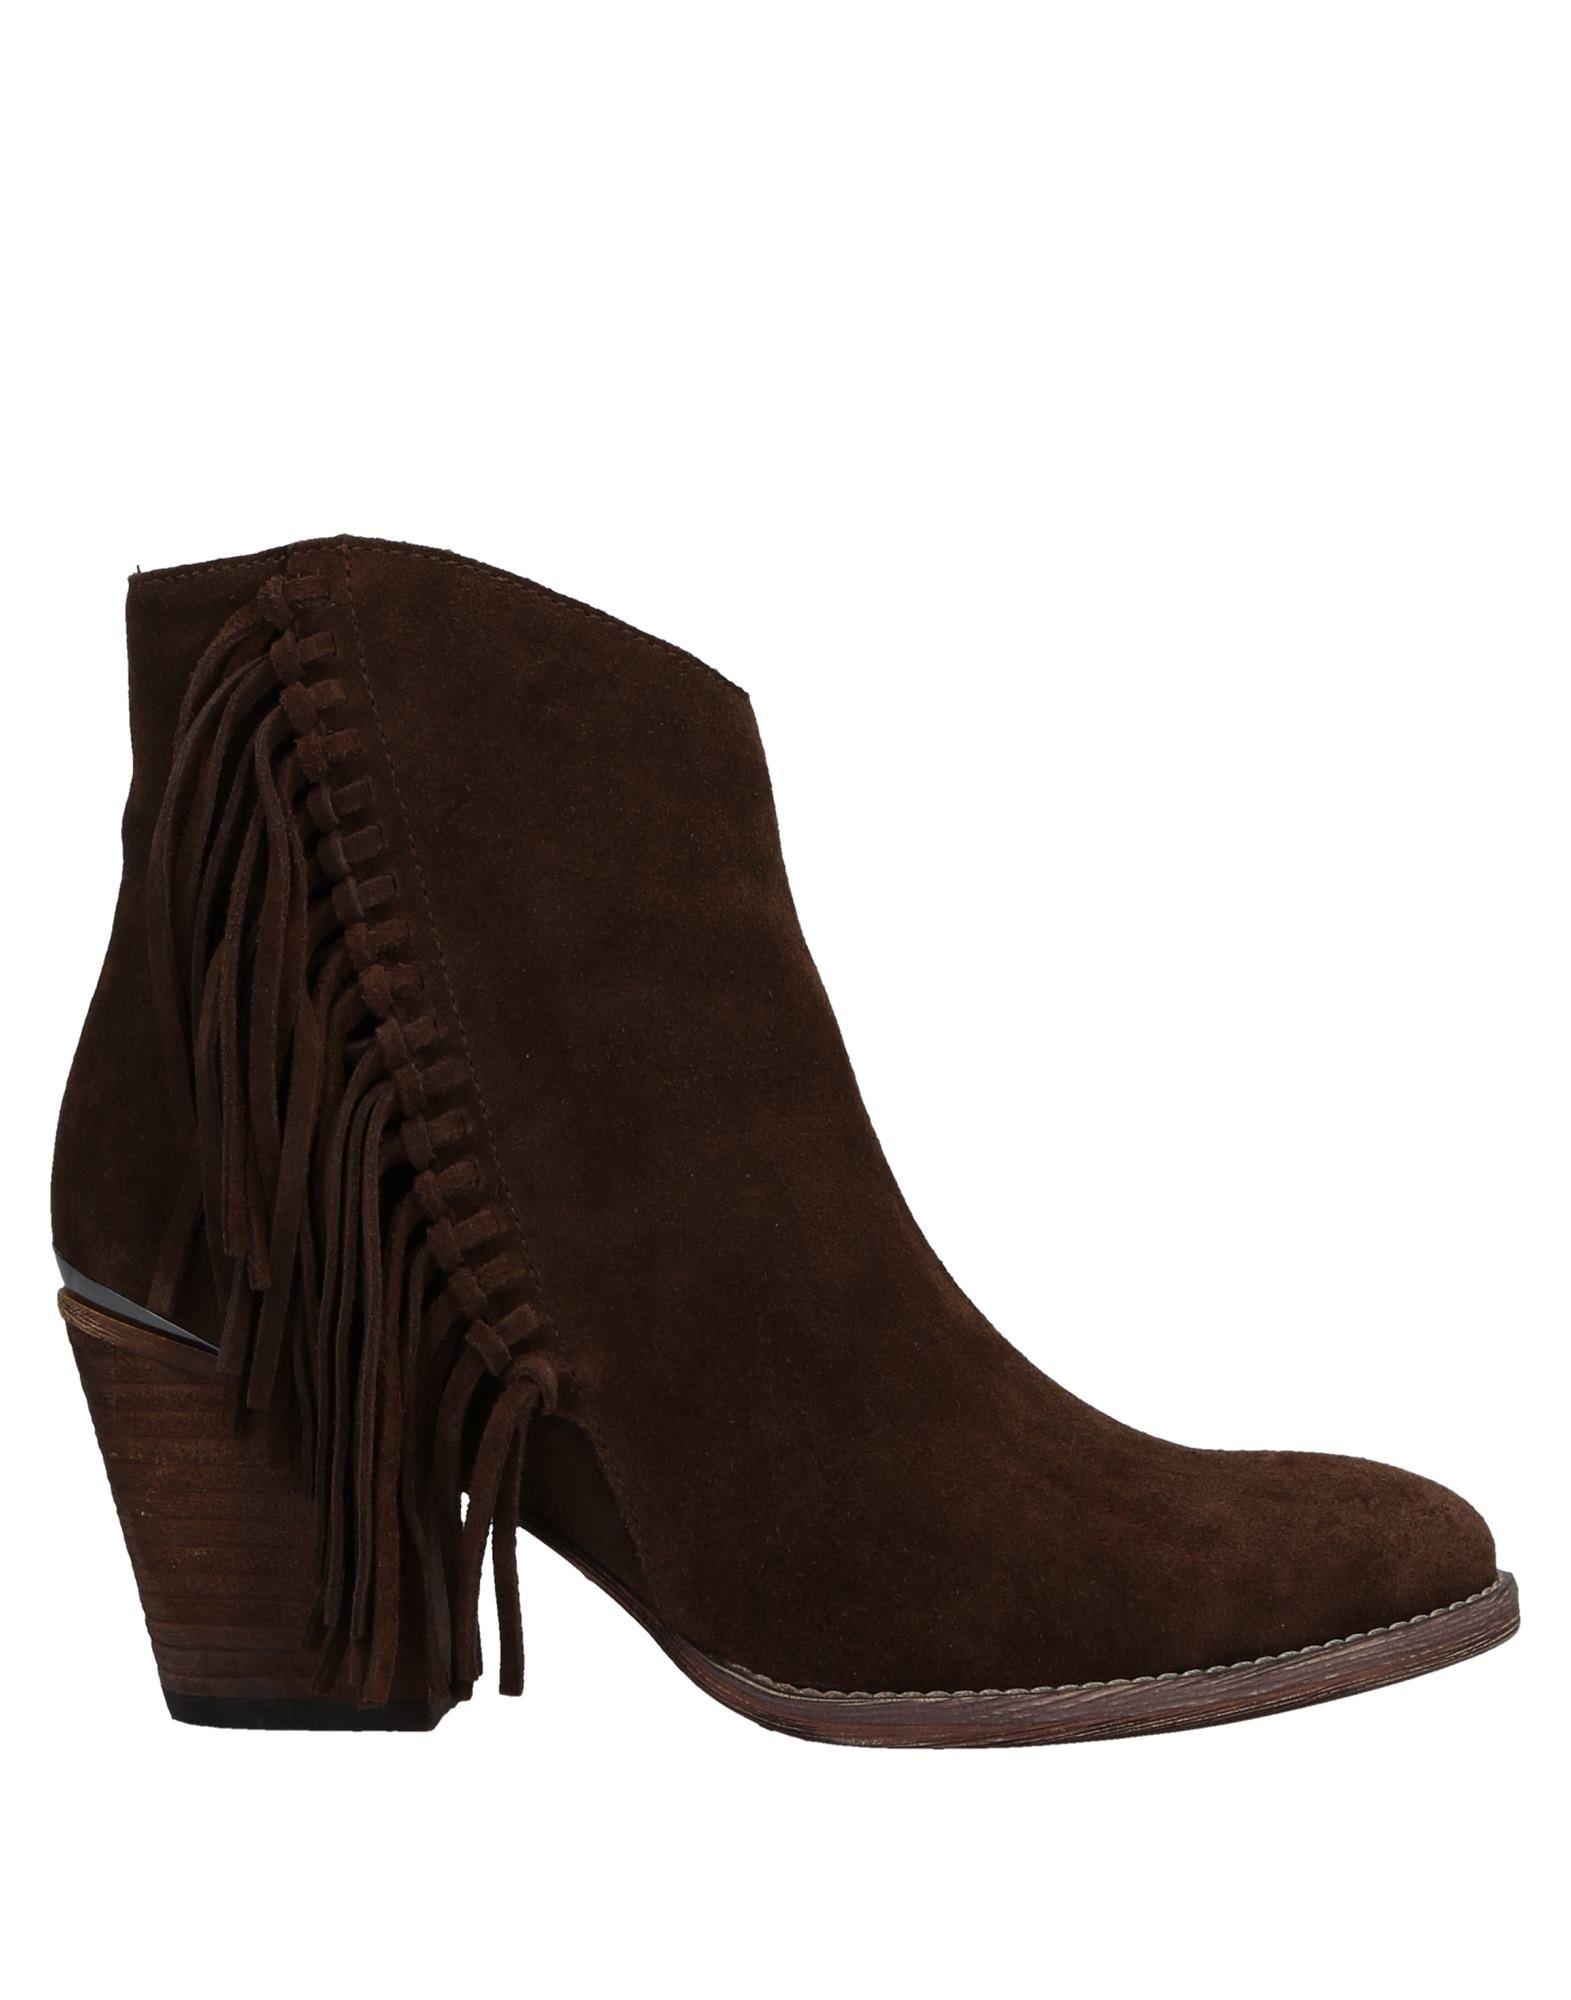 Alma En Pena. Stiefelette Damen  11459846QF Gute Qualität beliebte Schuhe